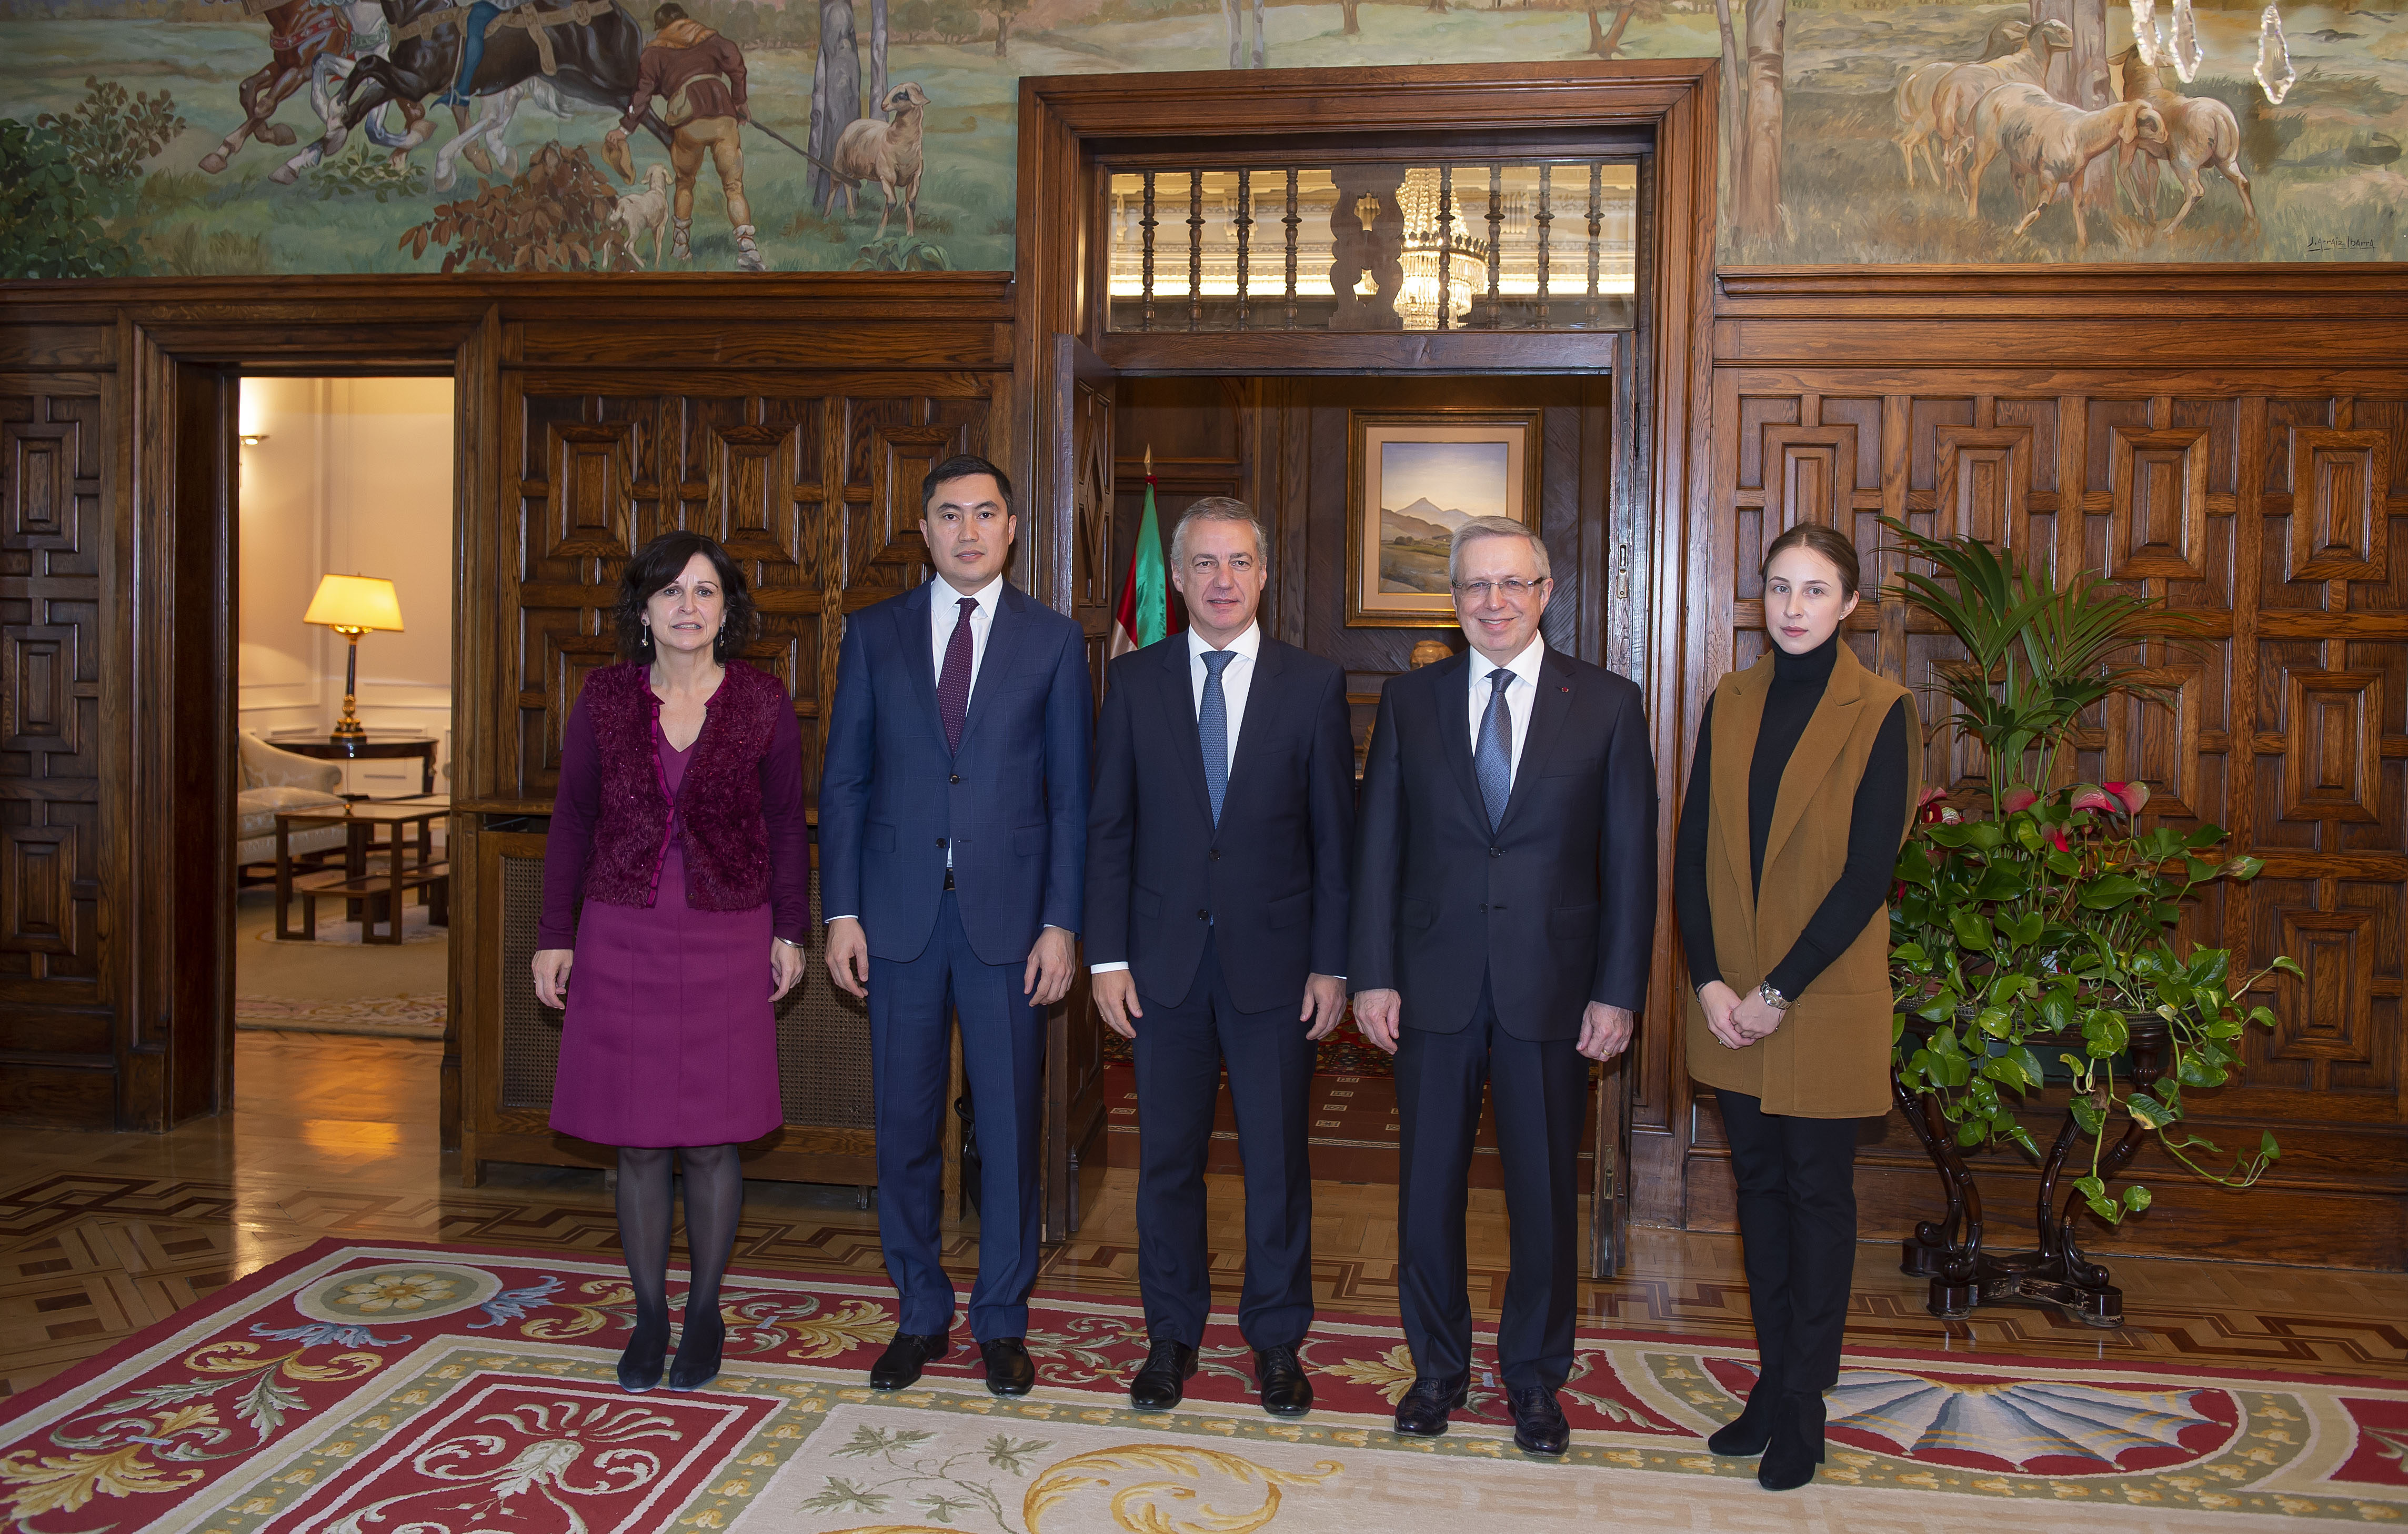 2018_10_24_lhk_embajador_kazajstan_13.jpg